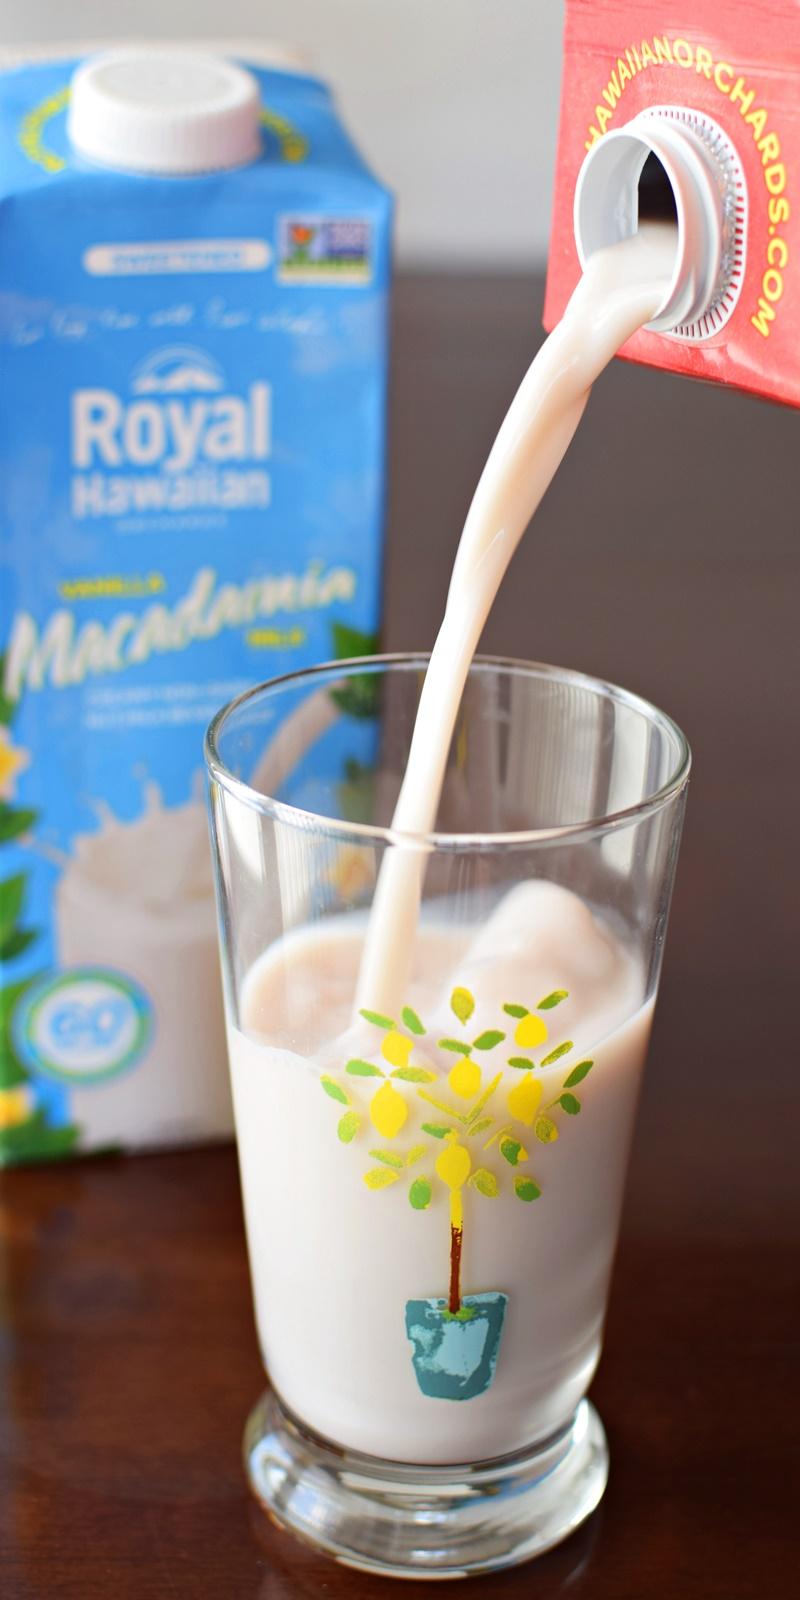 Royal Hawaiian Orchards Macadamia Milk - Creamy non-dairy nut milk beverages (dairy-free, soy-free & vegan)